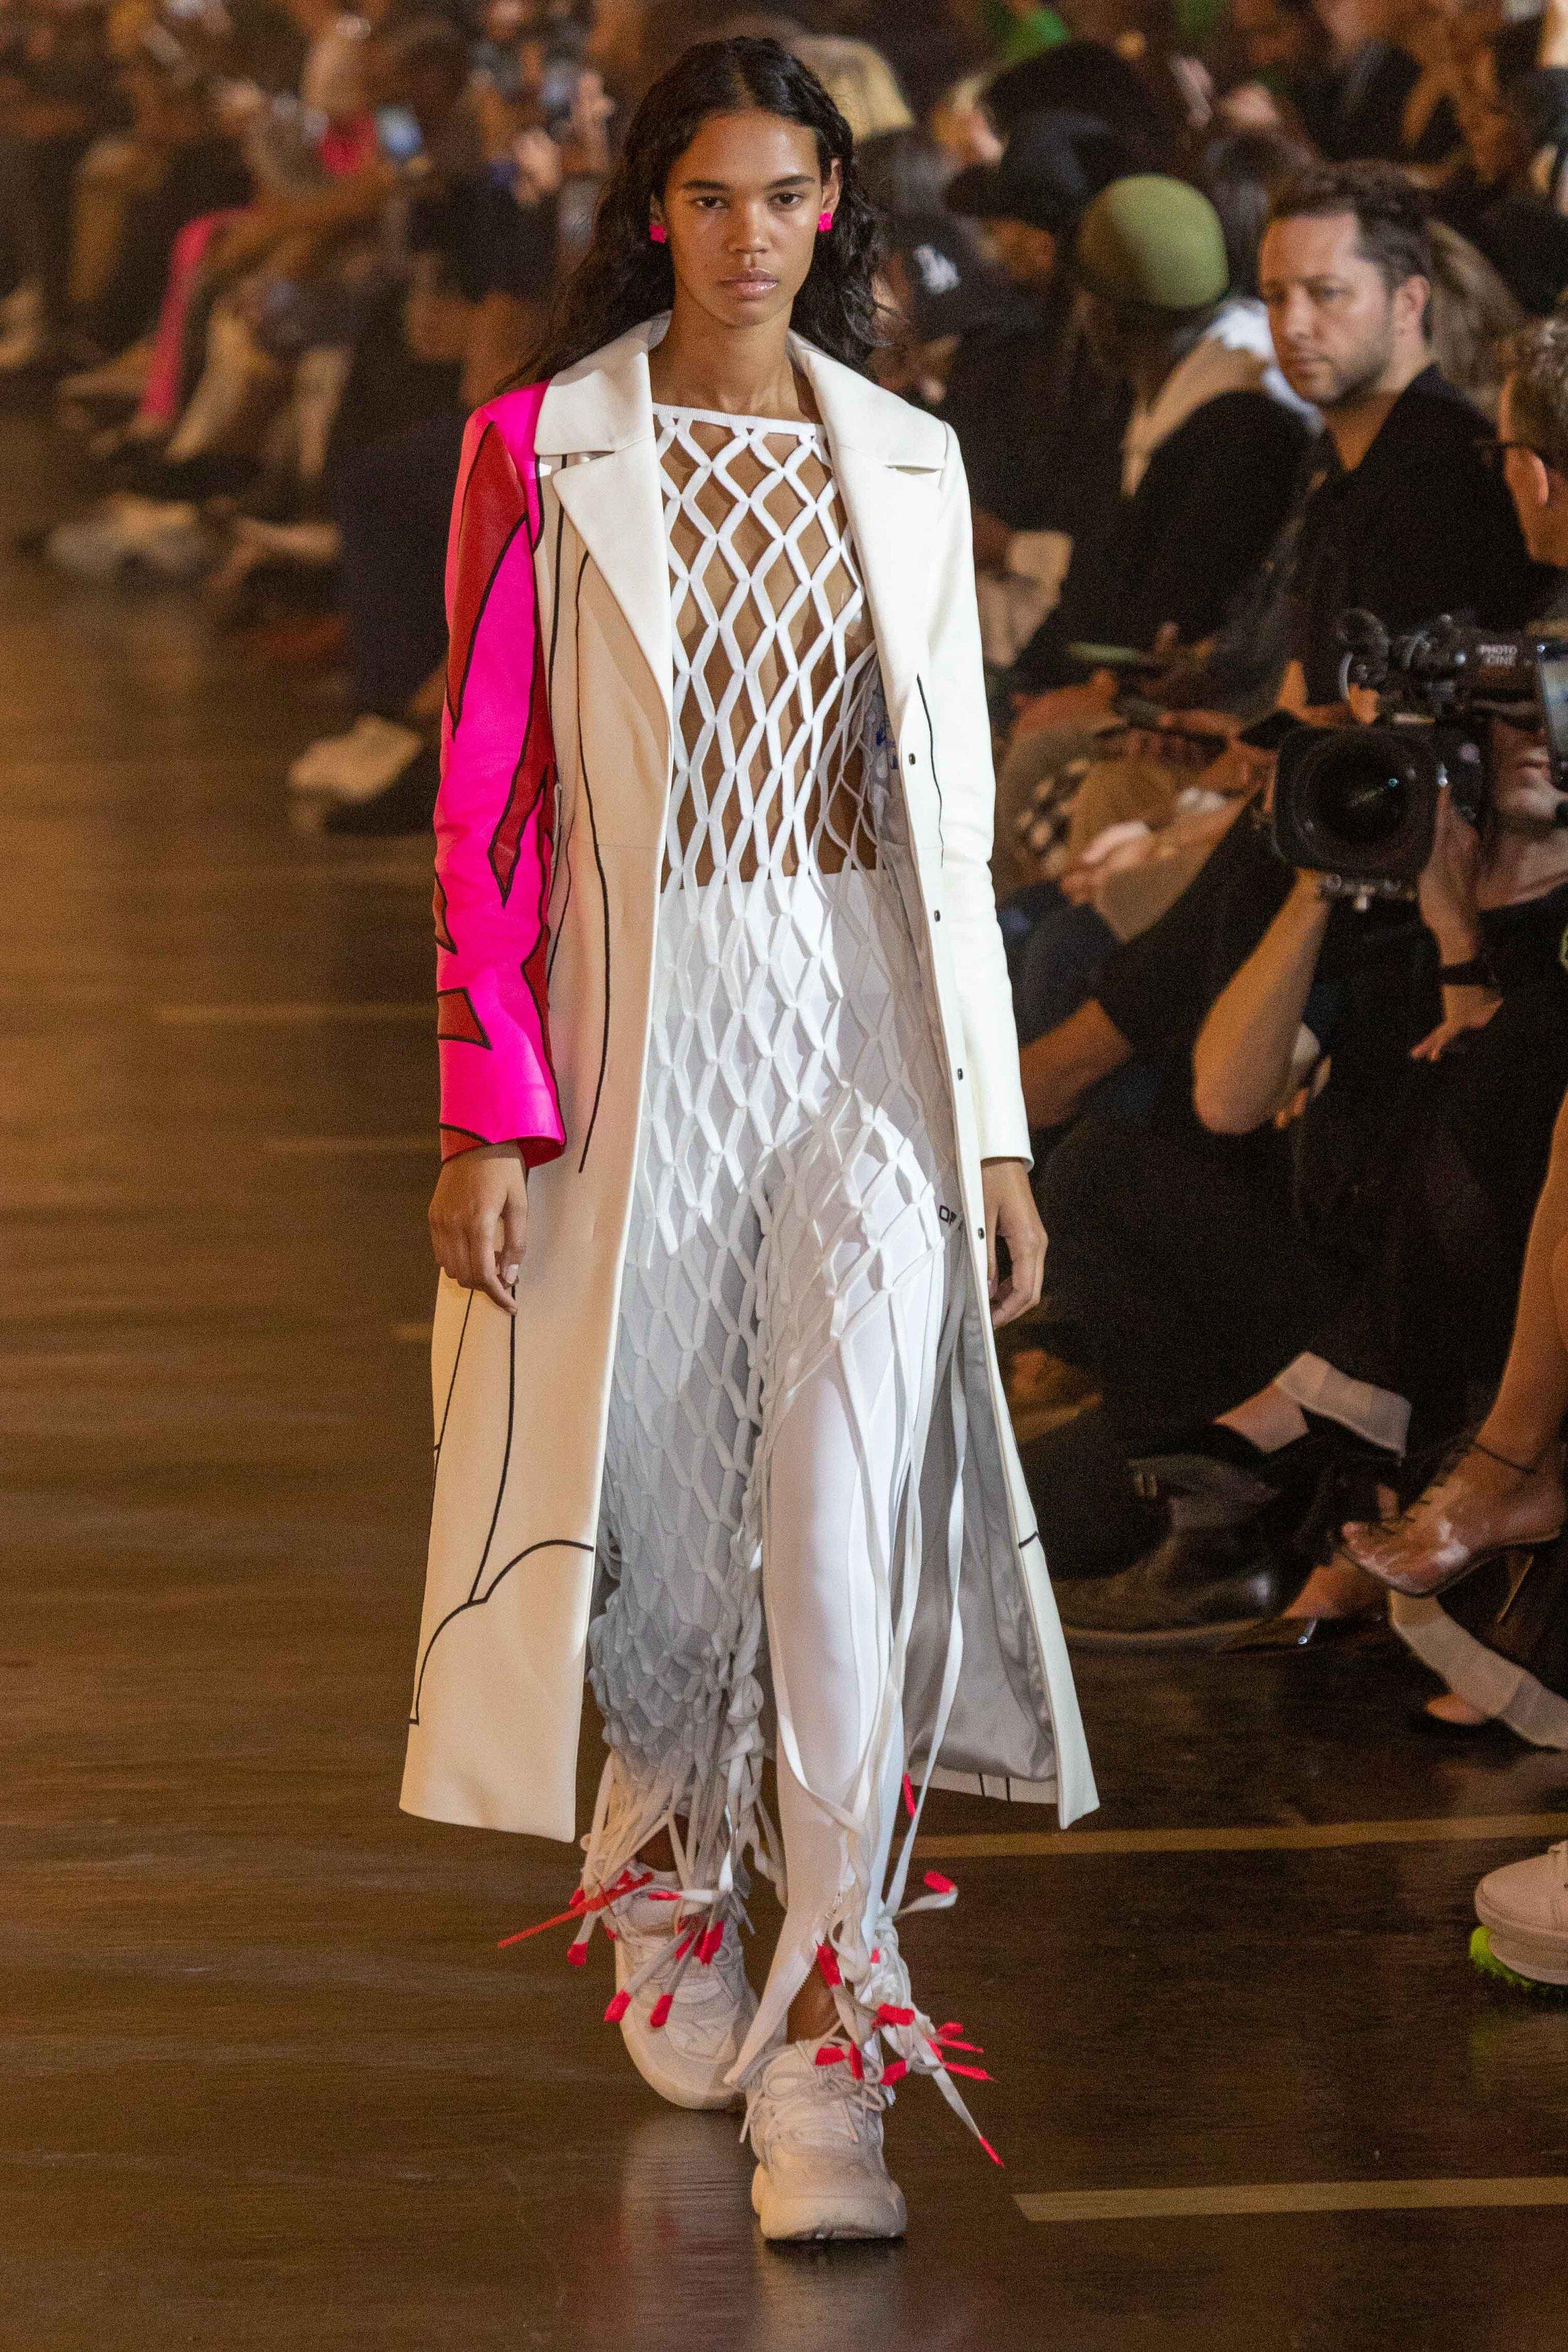 Runway OFF-WHITE during Paris Fashion Week© Alexis Breugelmans